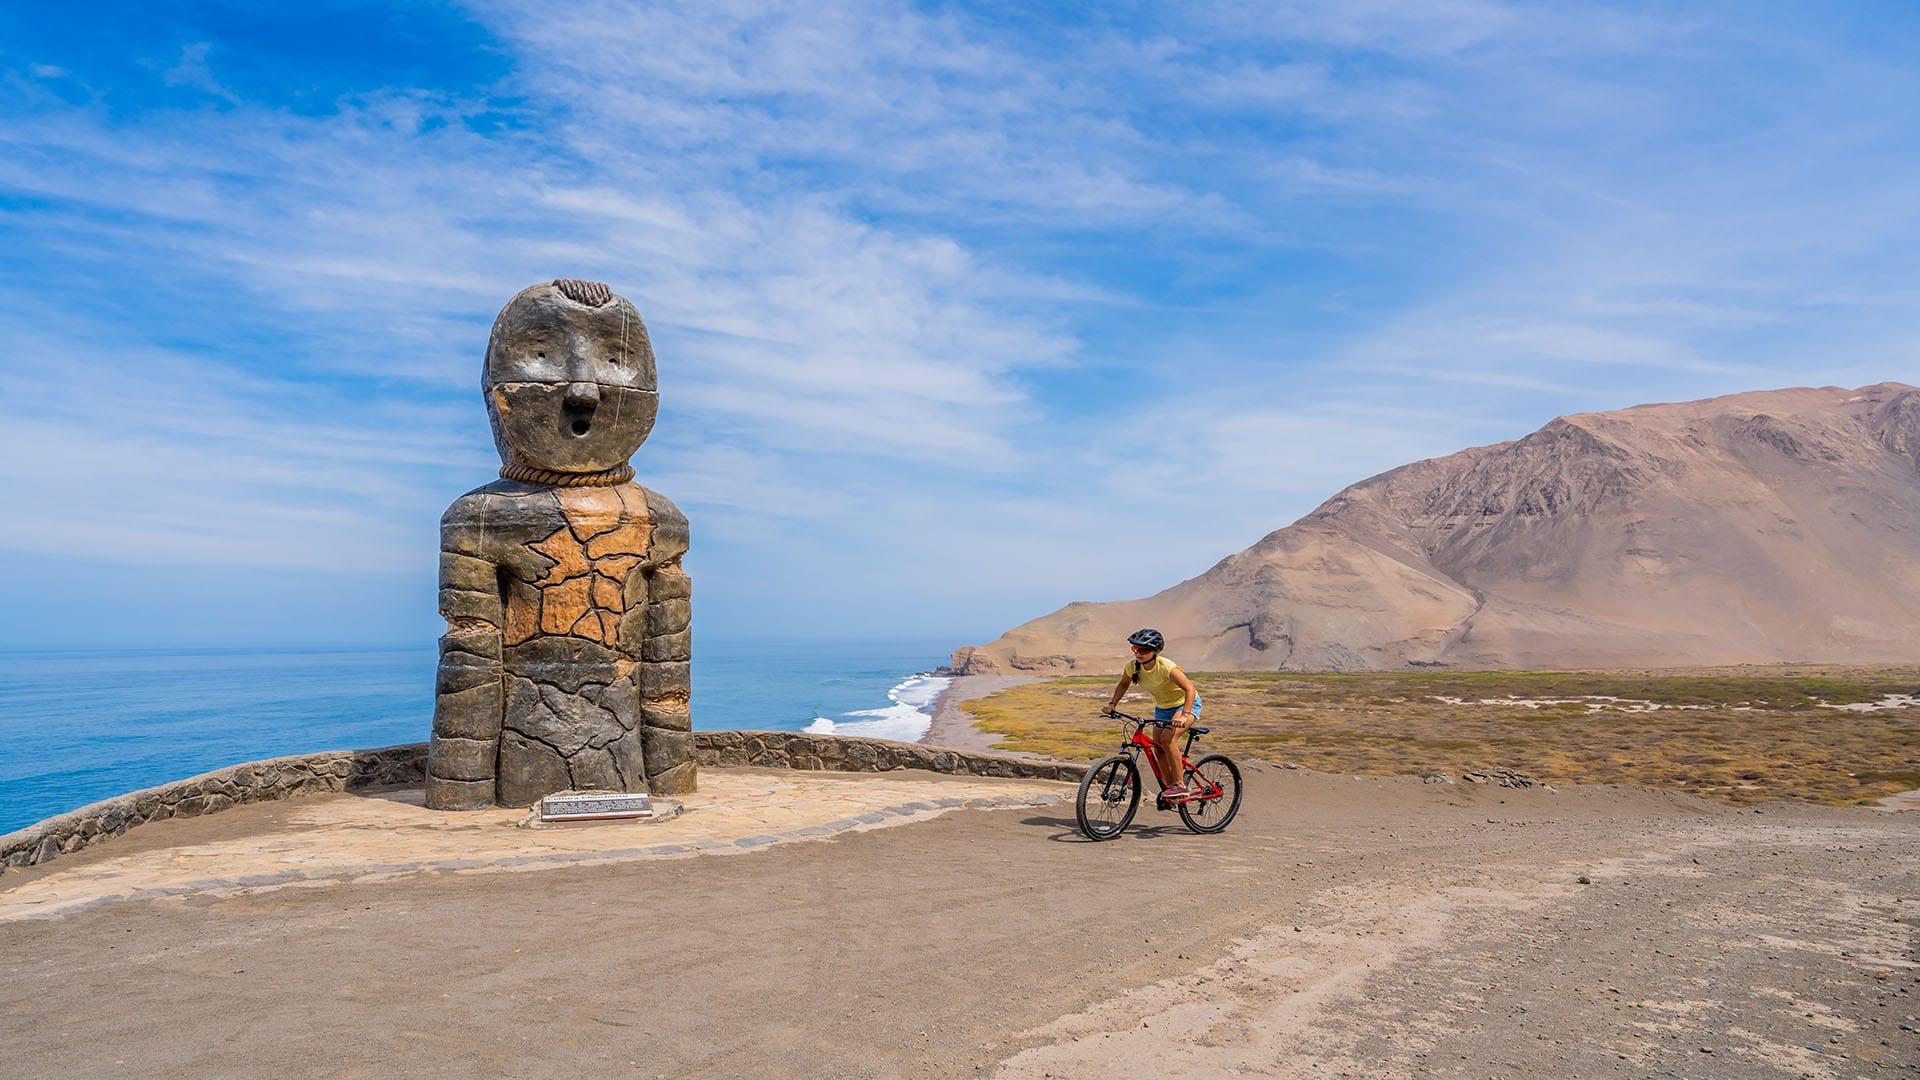 Escultura Cultura Chinchorro Camarones Arica y Parinacota 1